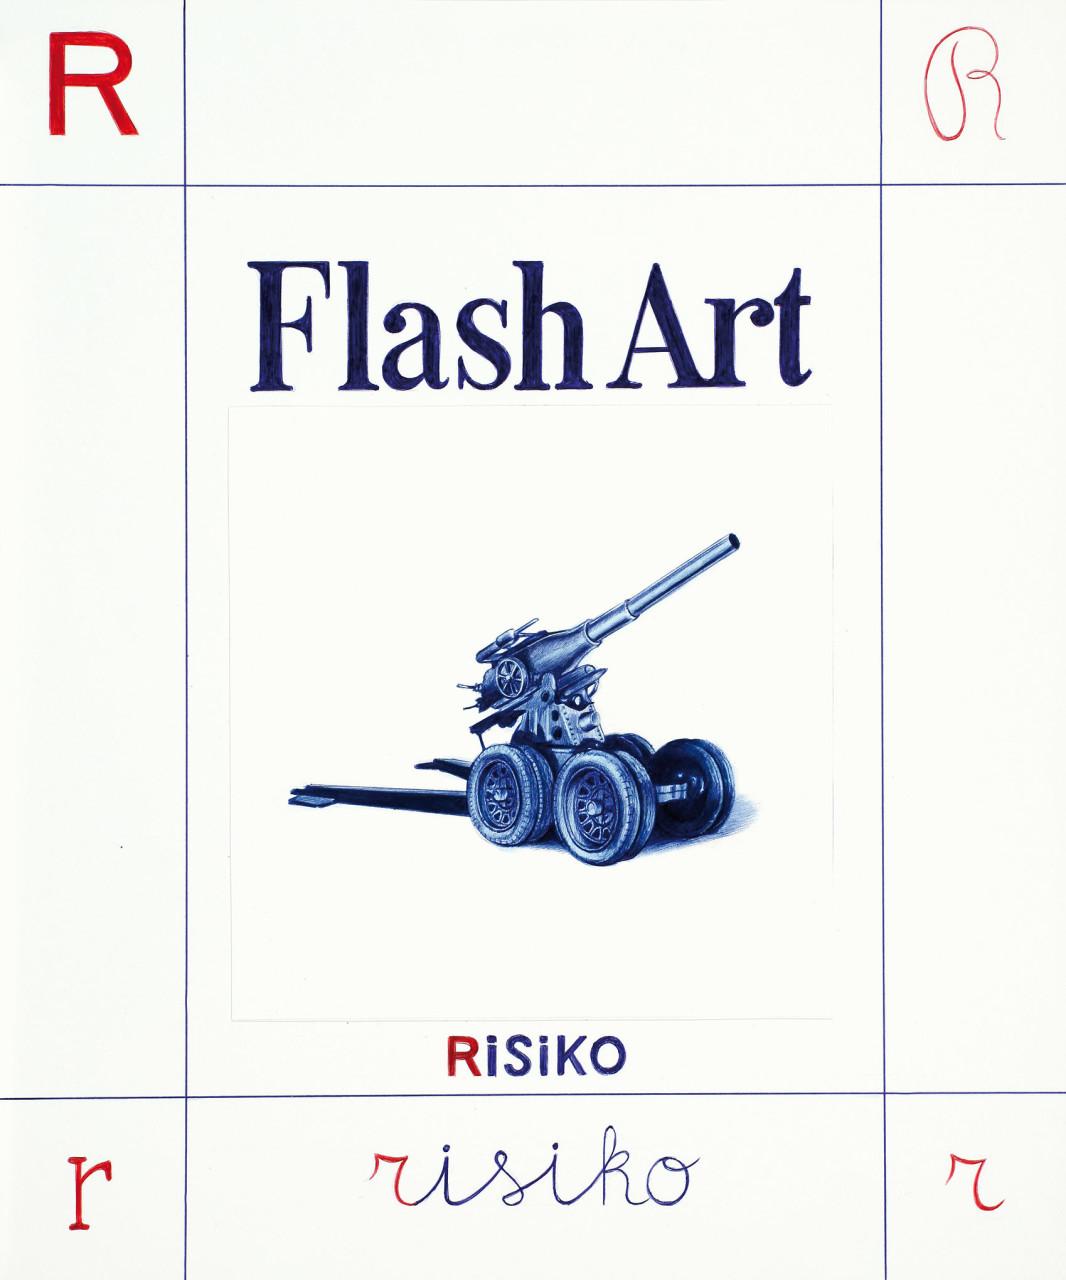 05R-risiko_bassa